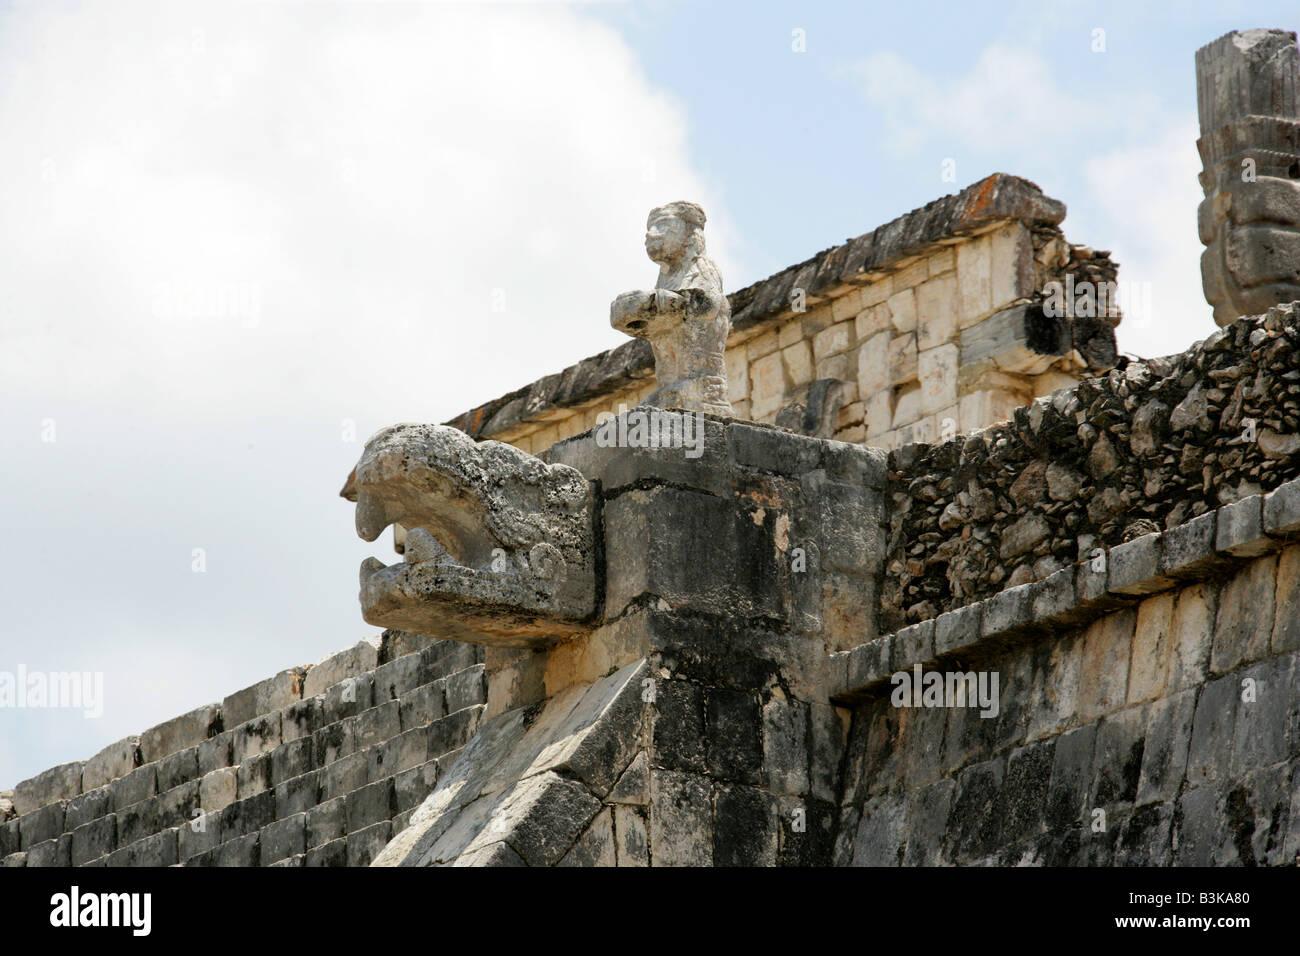 Detail of the Temple of the Warriors, Chichen Itza Archaeological Site, Chichen Itza, Yucatan Peninsula, Mexico Stock Photo